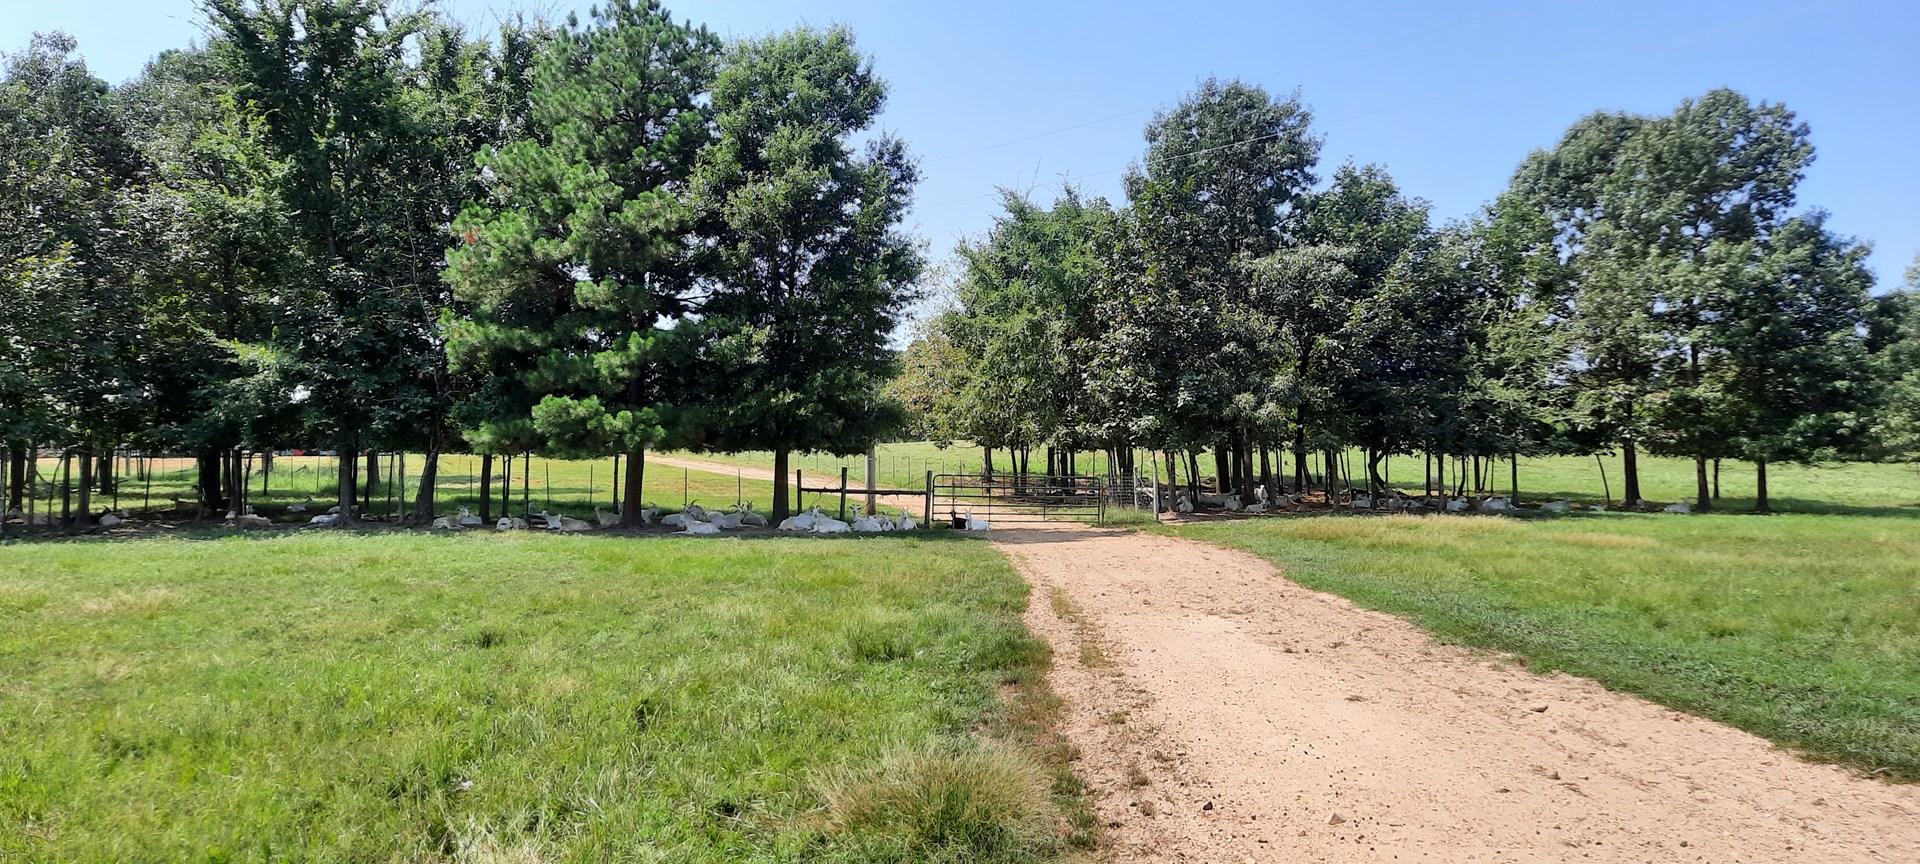 Goat Farm Land For Sale Antlers Oklahoma Pushmataha County